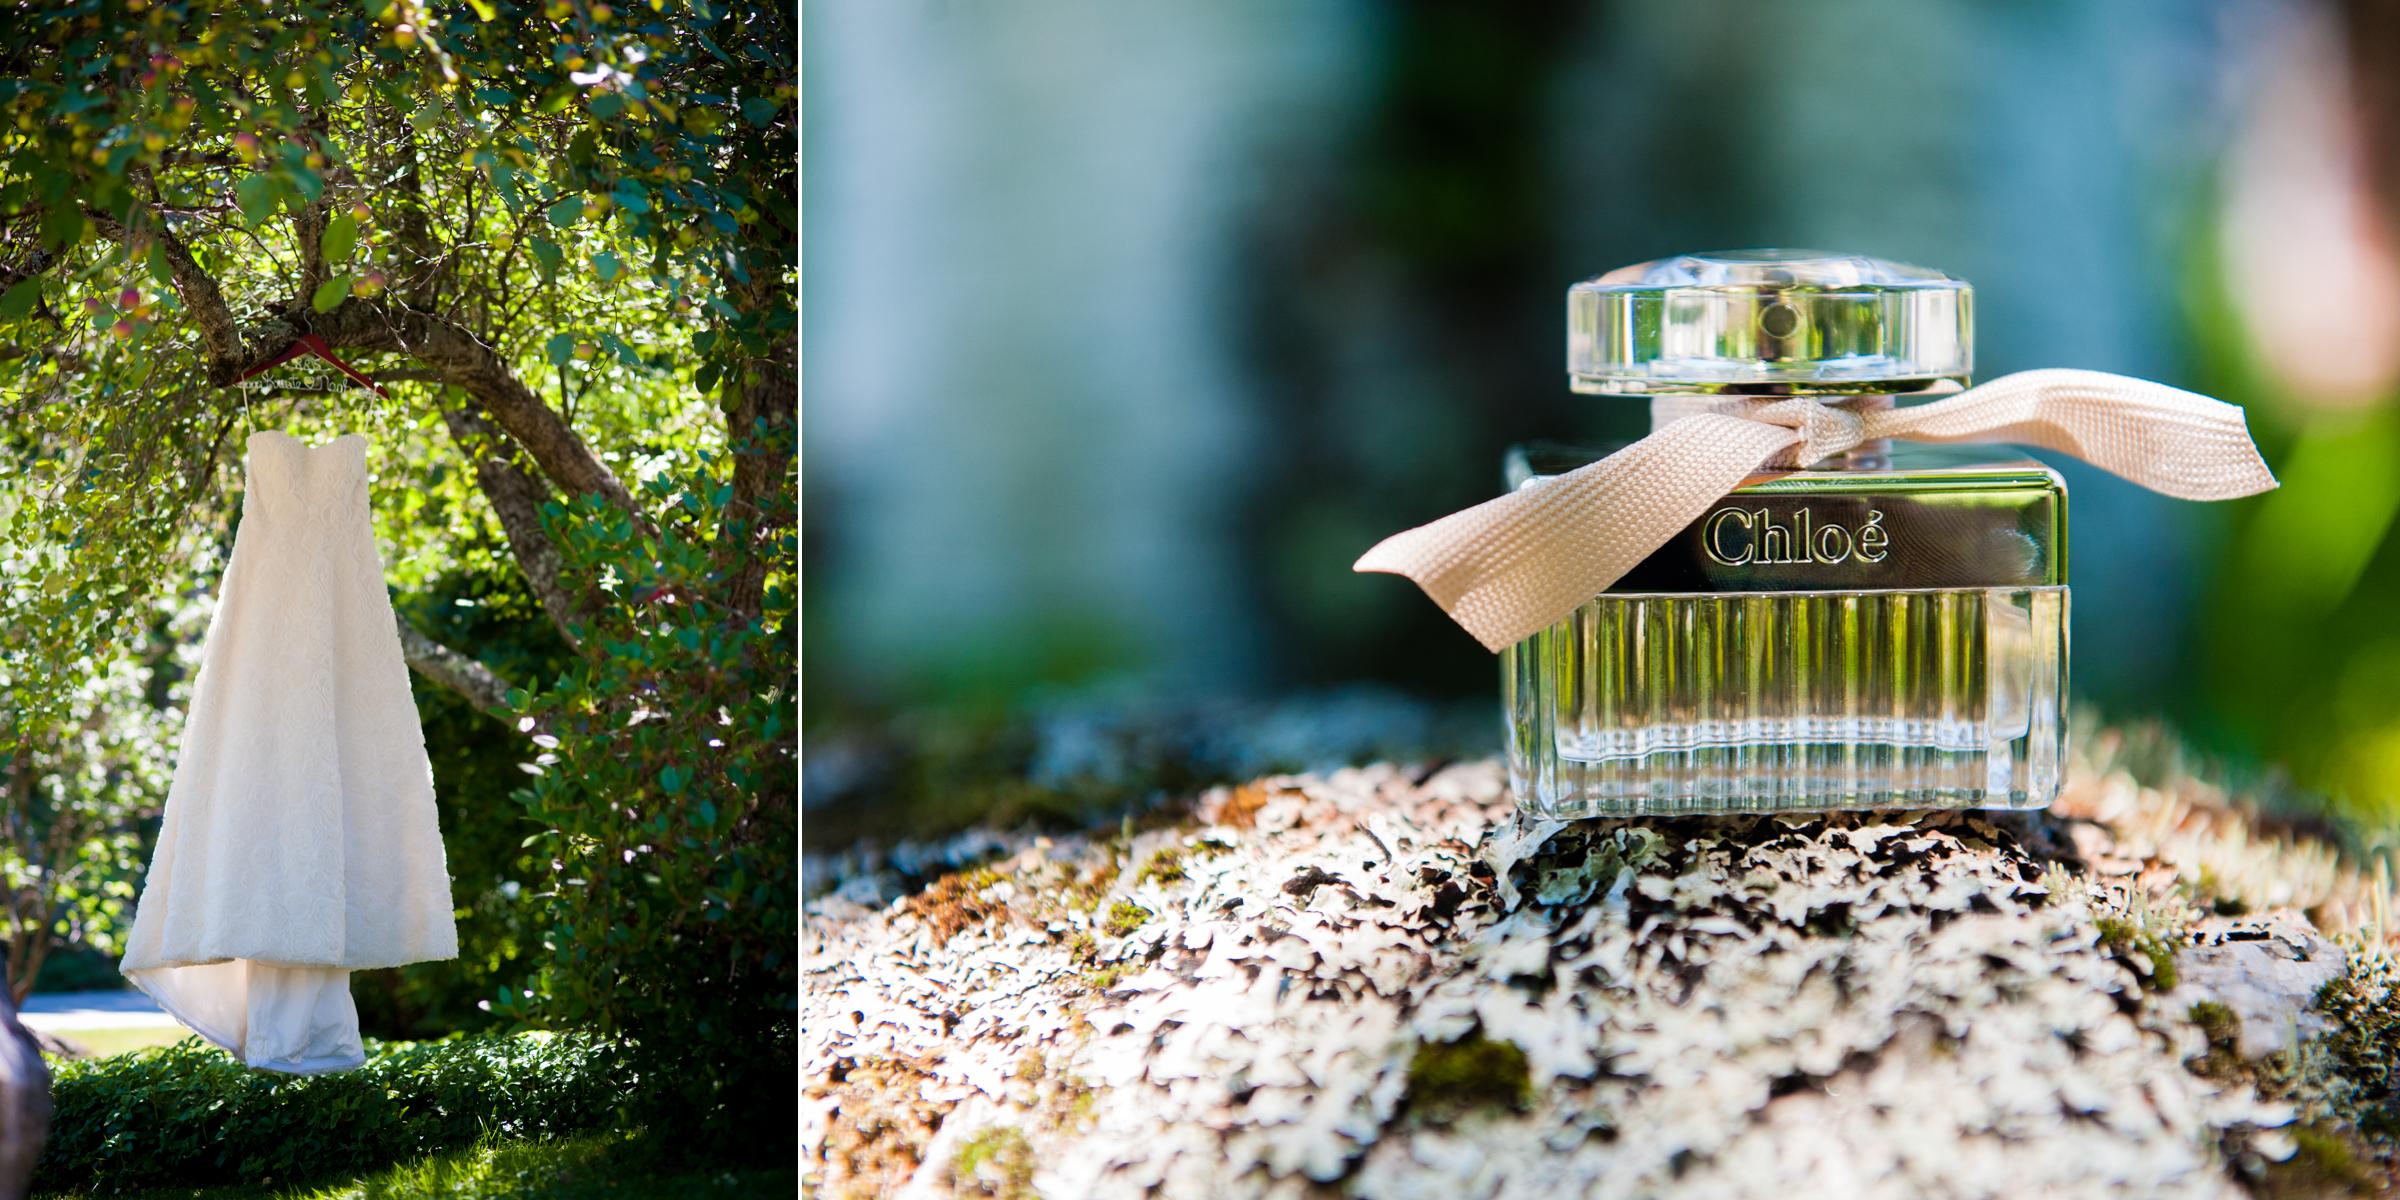 beautiful wedding details included elegant chloe perfume and a beautiful lace wedding dress